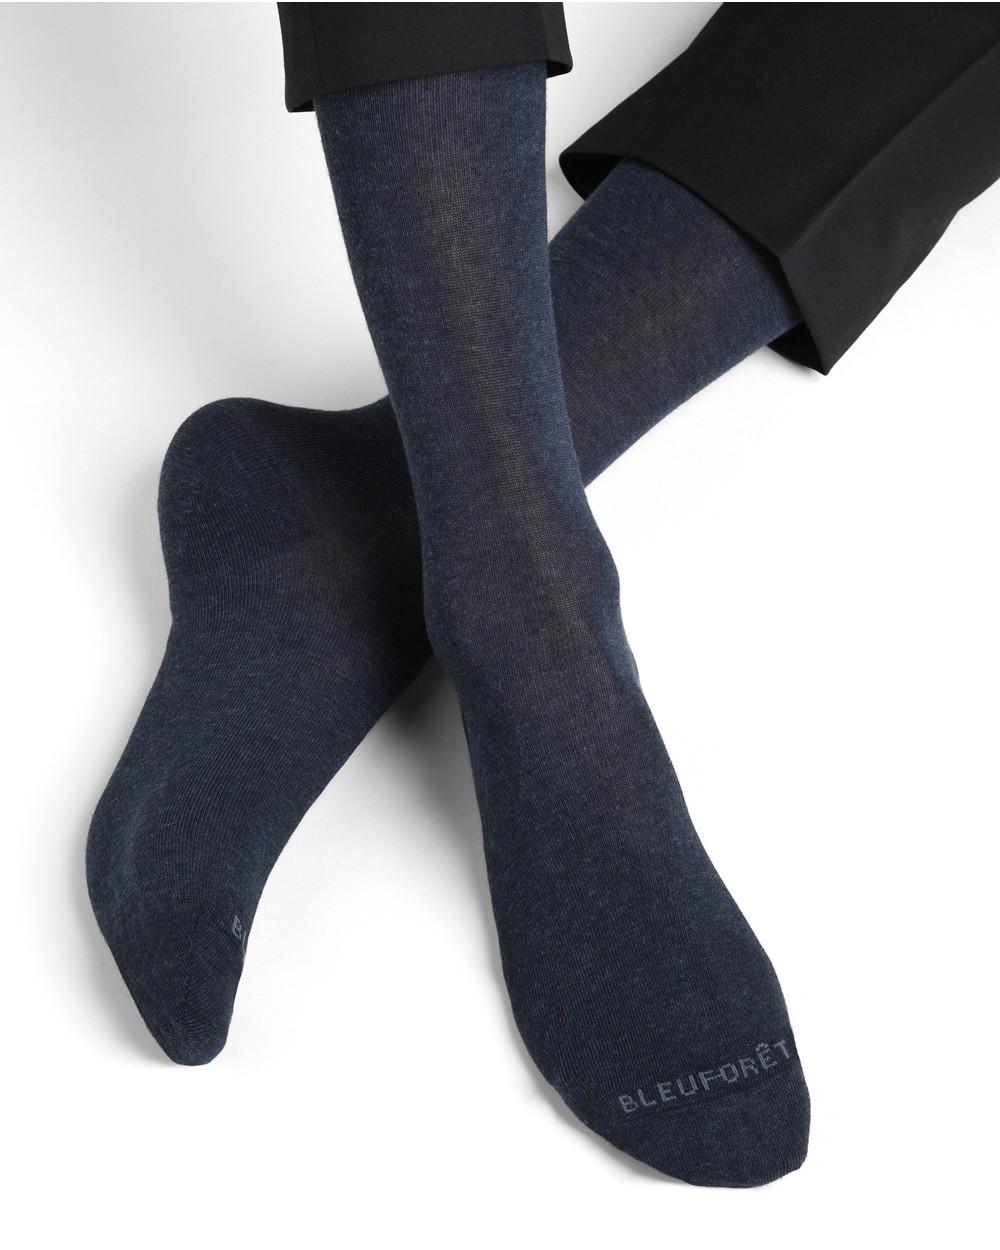 Plain seamless cotton socks